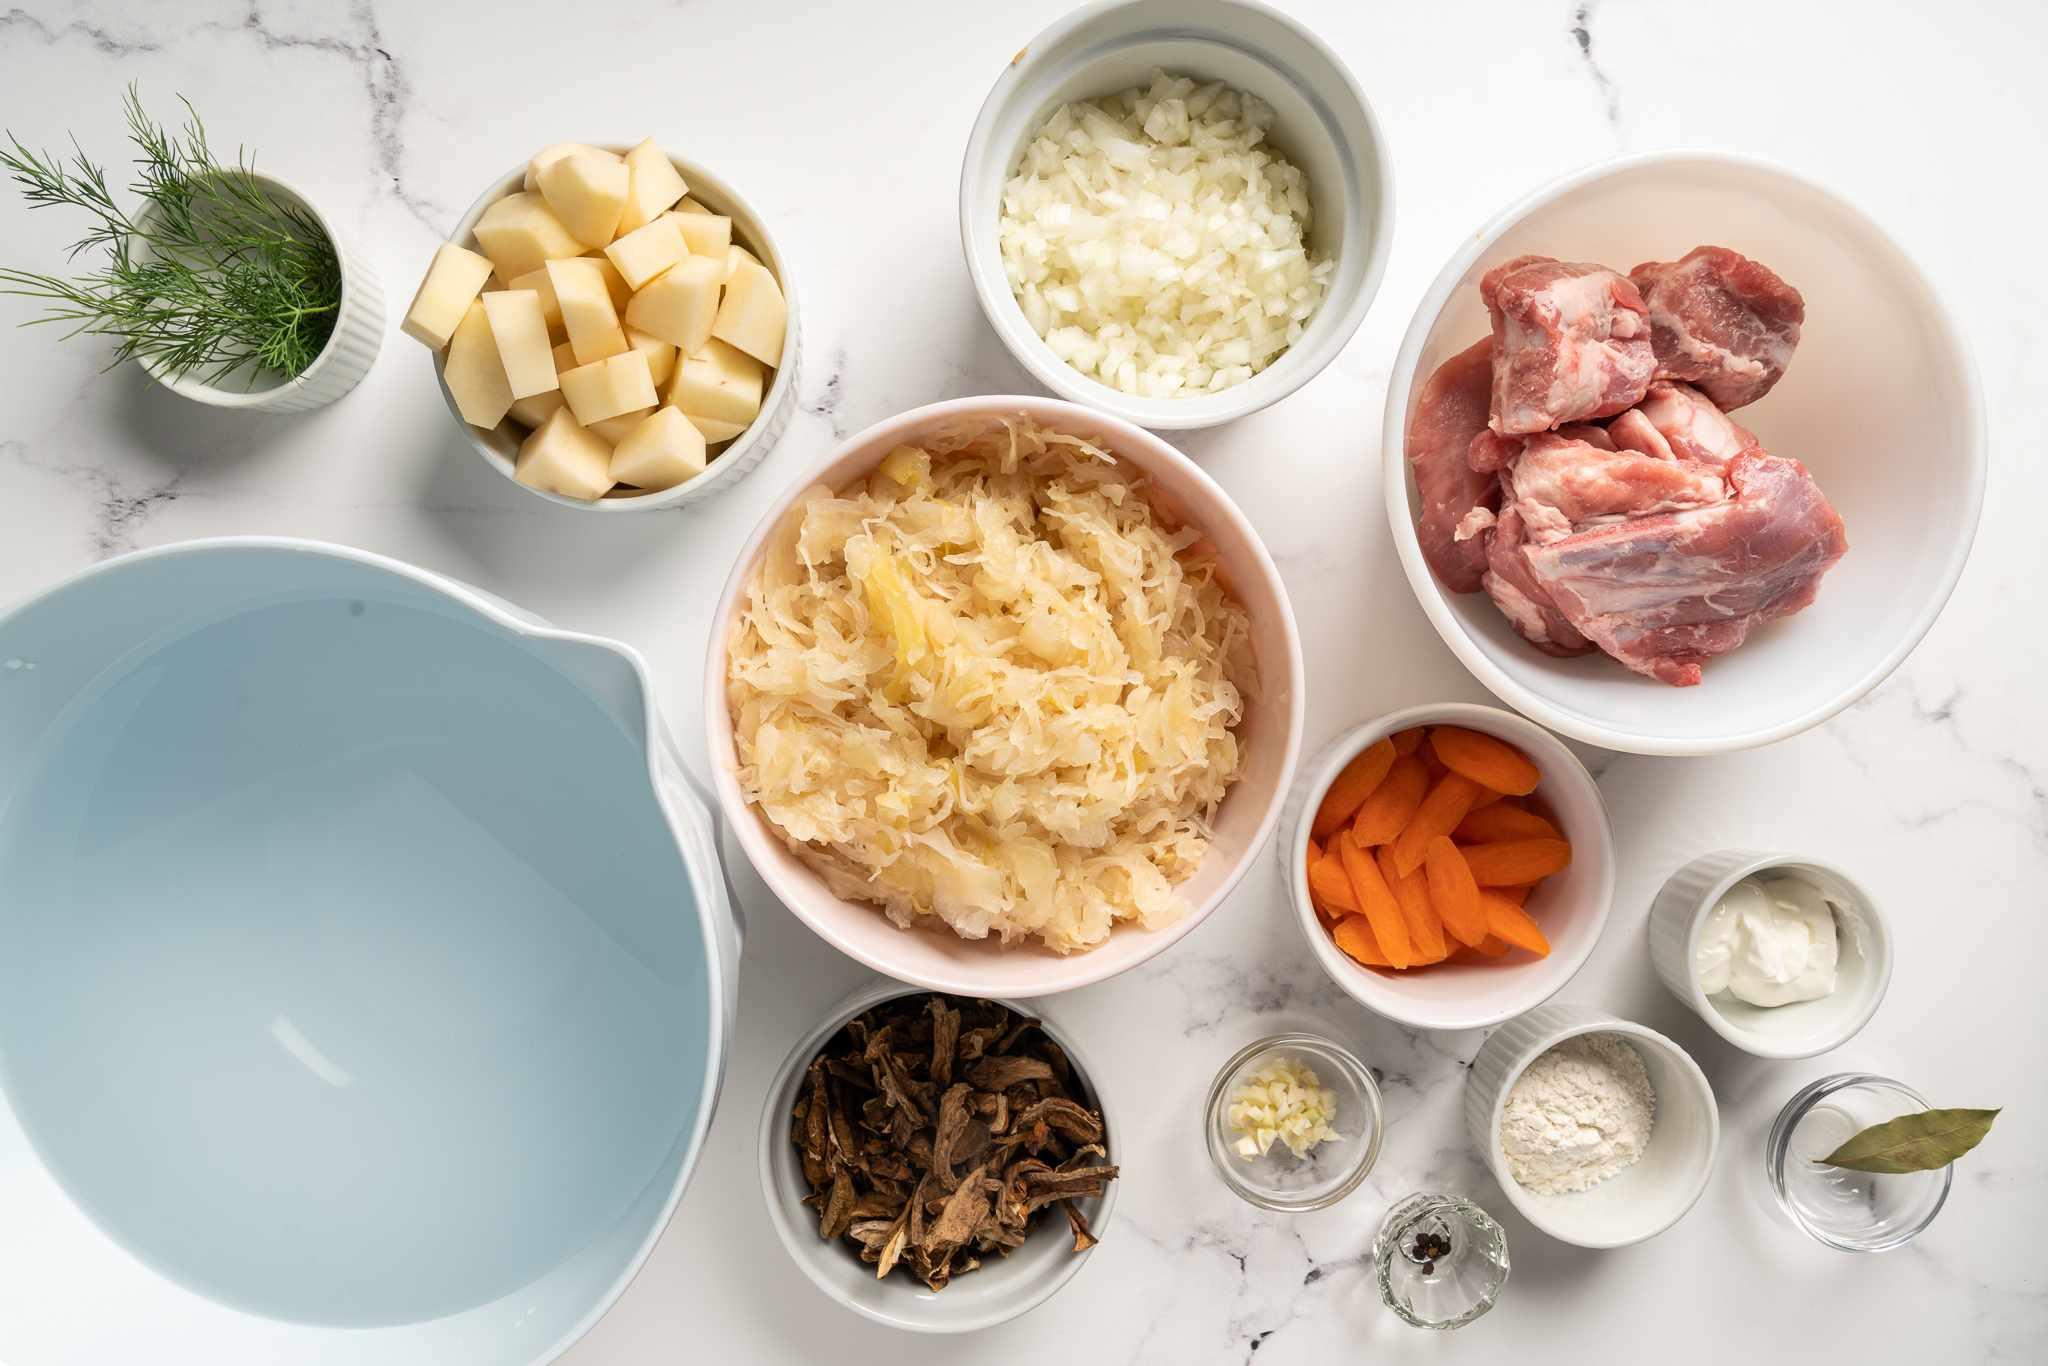 Ukrainian Sauerkraut Soup (Kapusnyak) ingredients